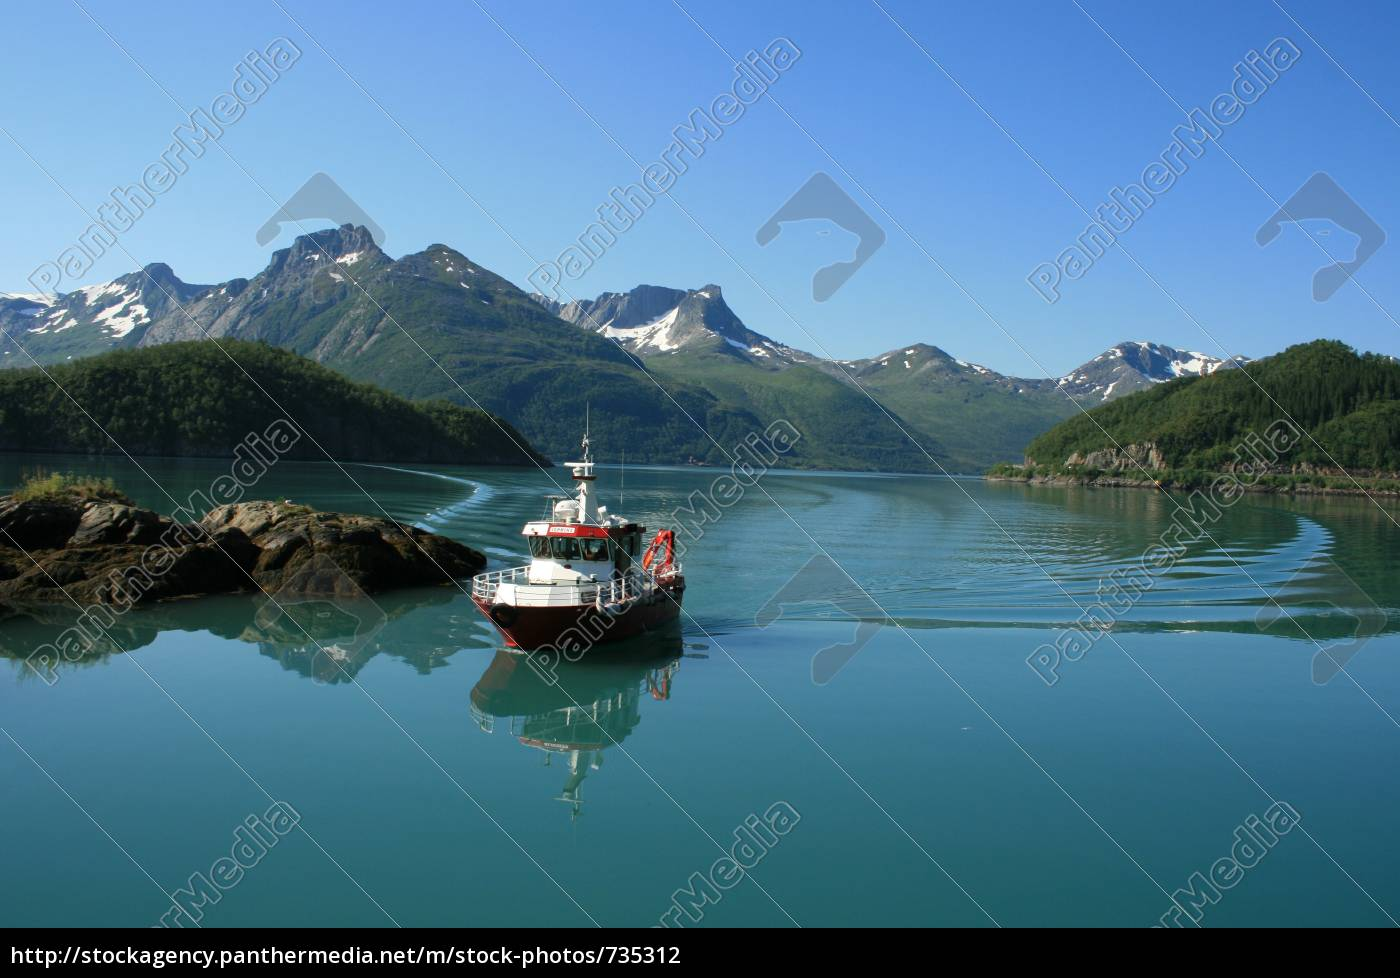 glacier, ferry - 735312